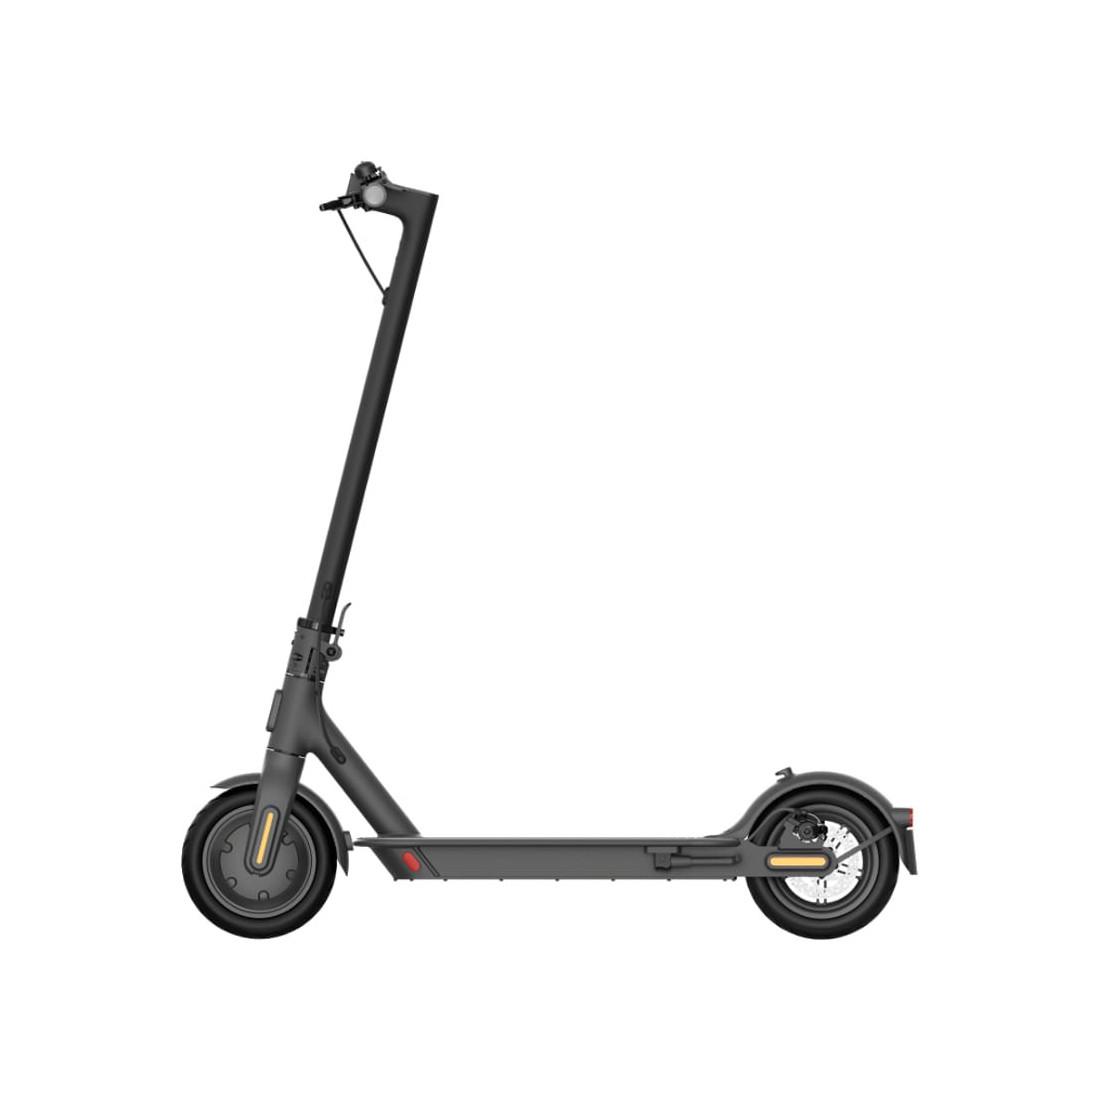 Электросамокат Xiaomi MiJia Smart Electric Scooter Essential FBC4022G - фото 4